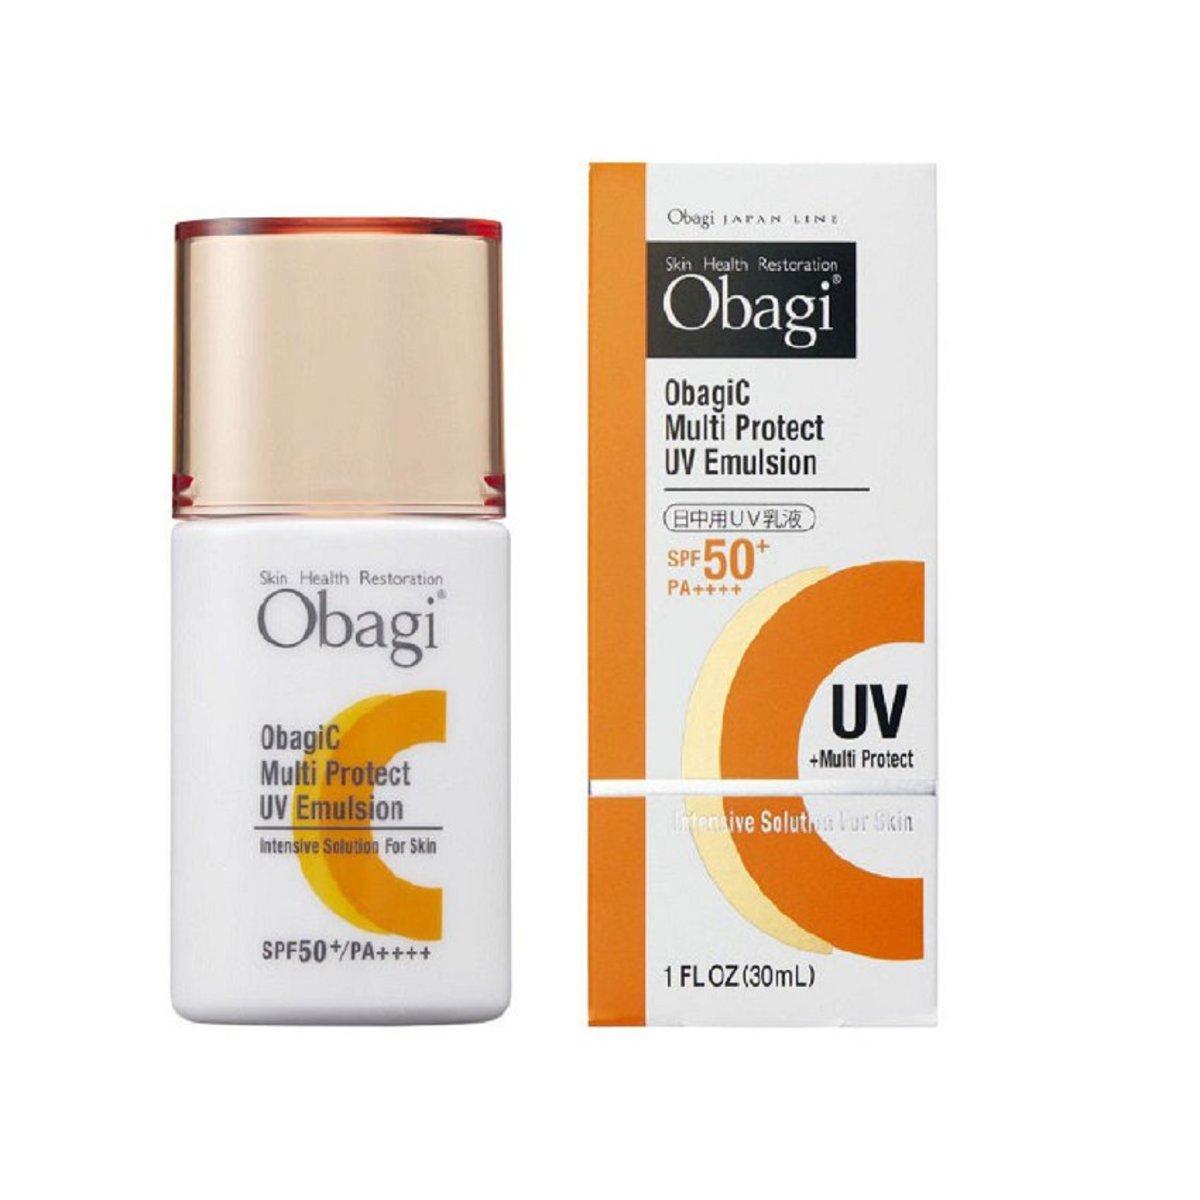 ObagiC Multi Protect UV Emulsion SPF50+ PA++++ 30ml   [Parallel Import]